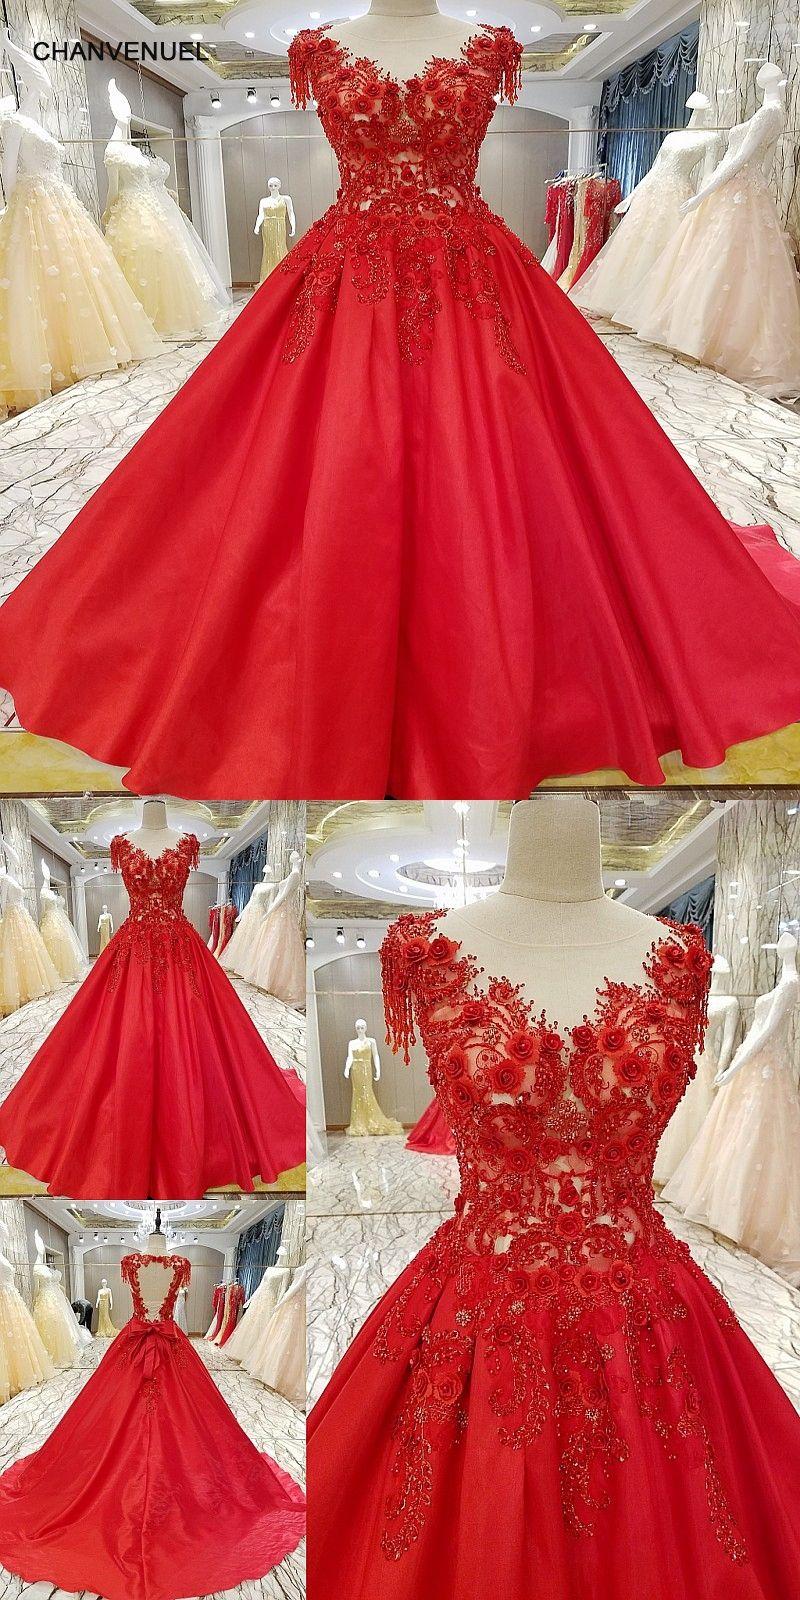 Ls elegant arabic evening gowns dresses women dress for wedding